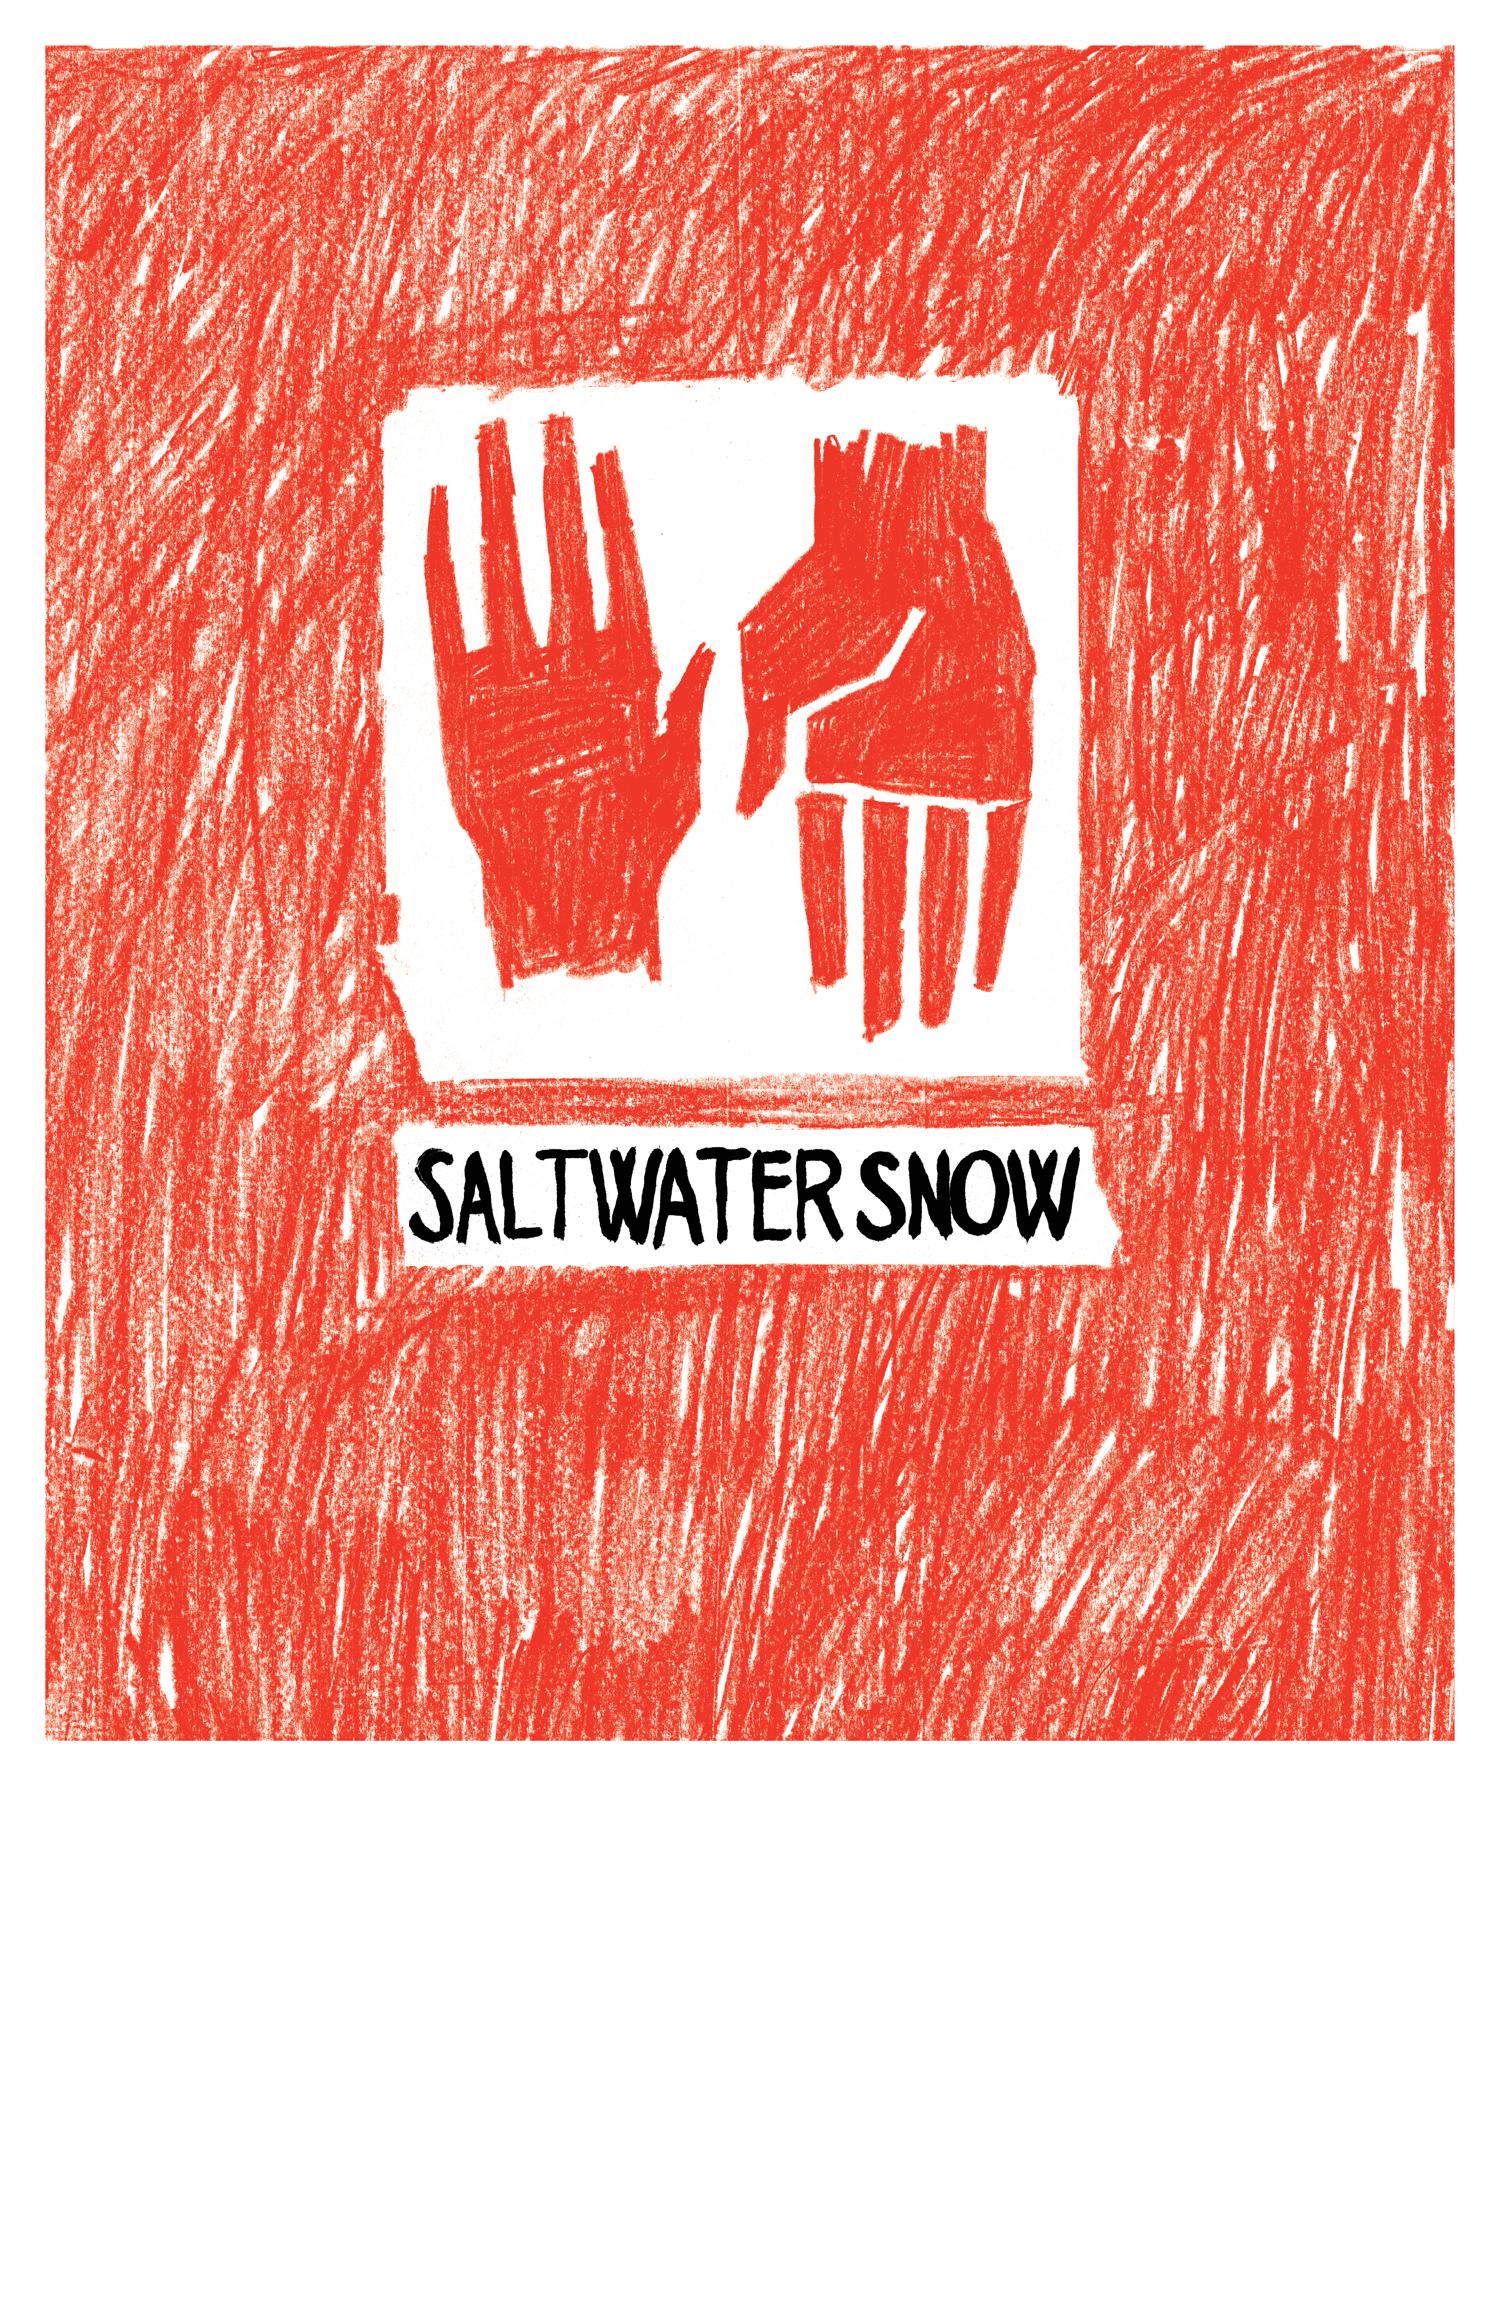 SaltwaterSnowWEB.jpg